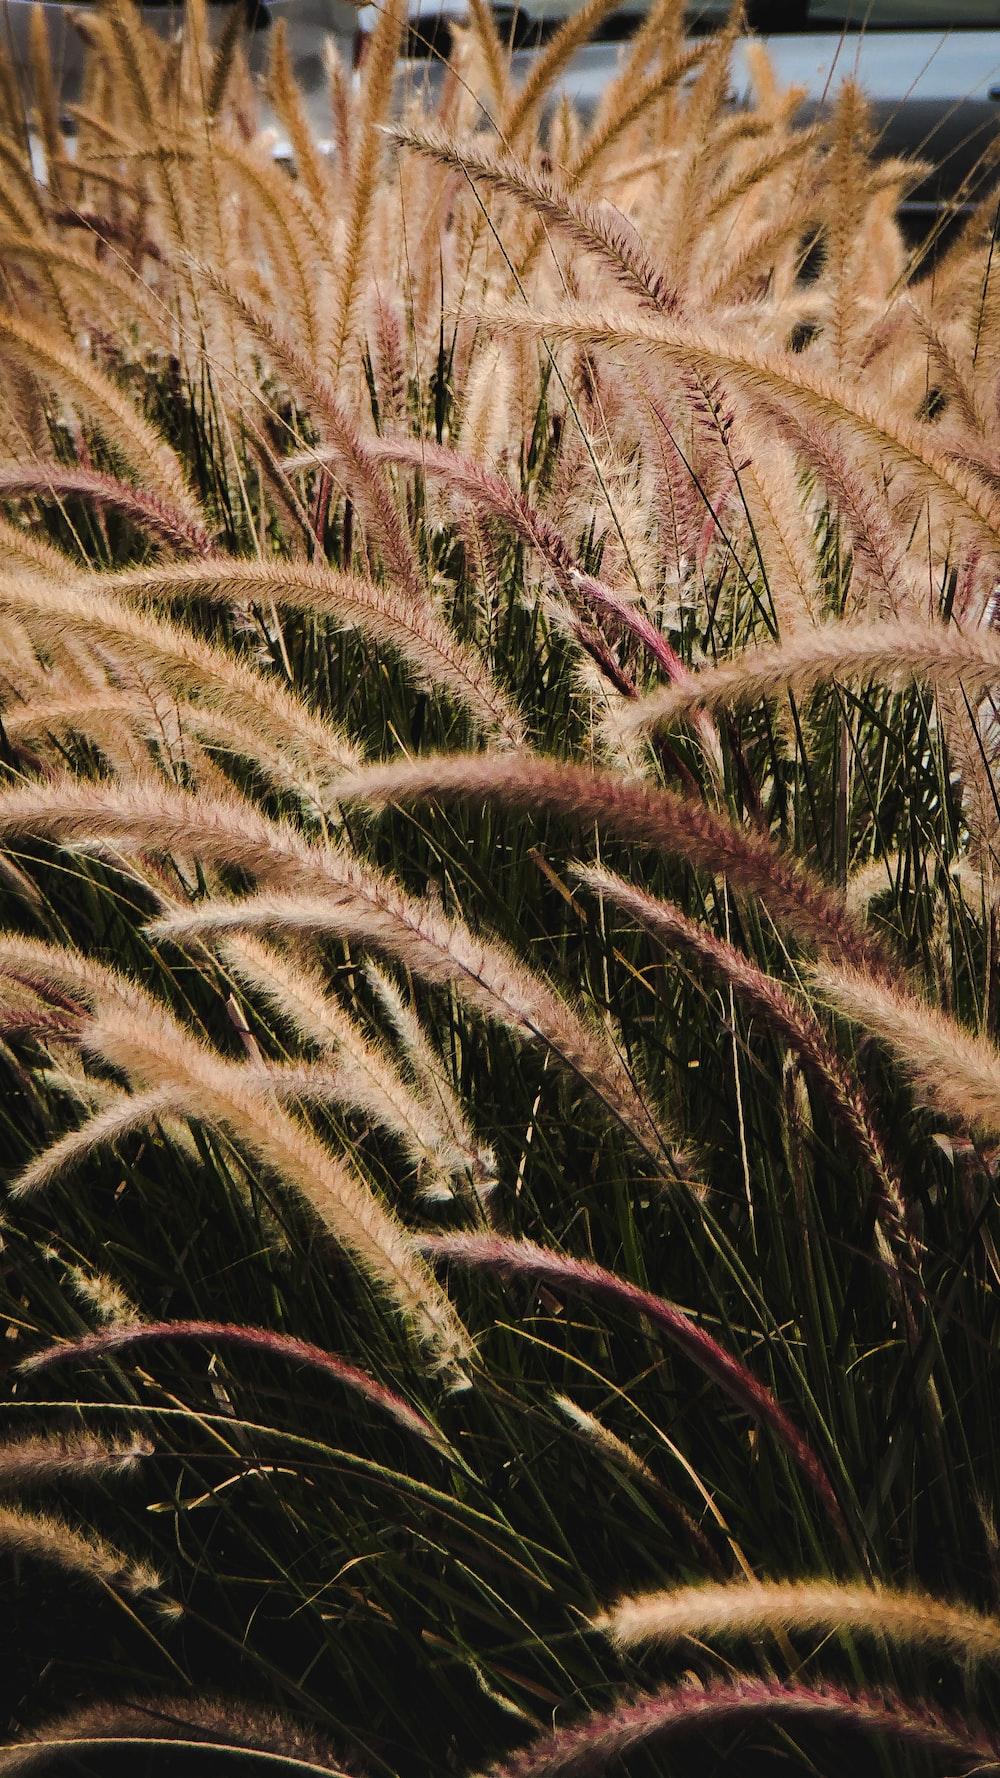 shallow focus photo of plants